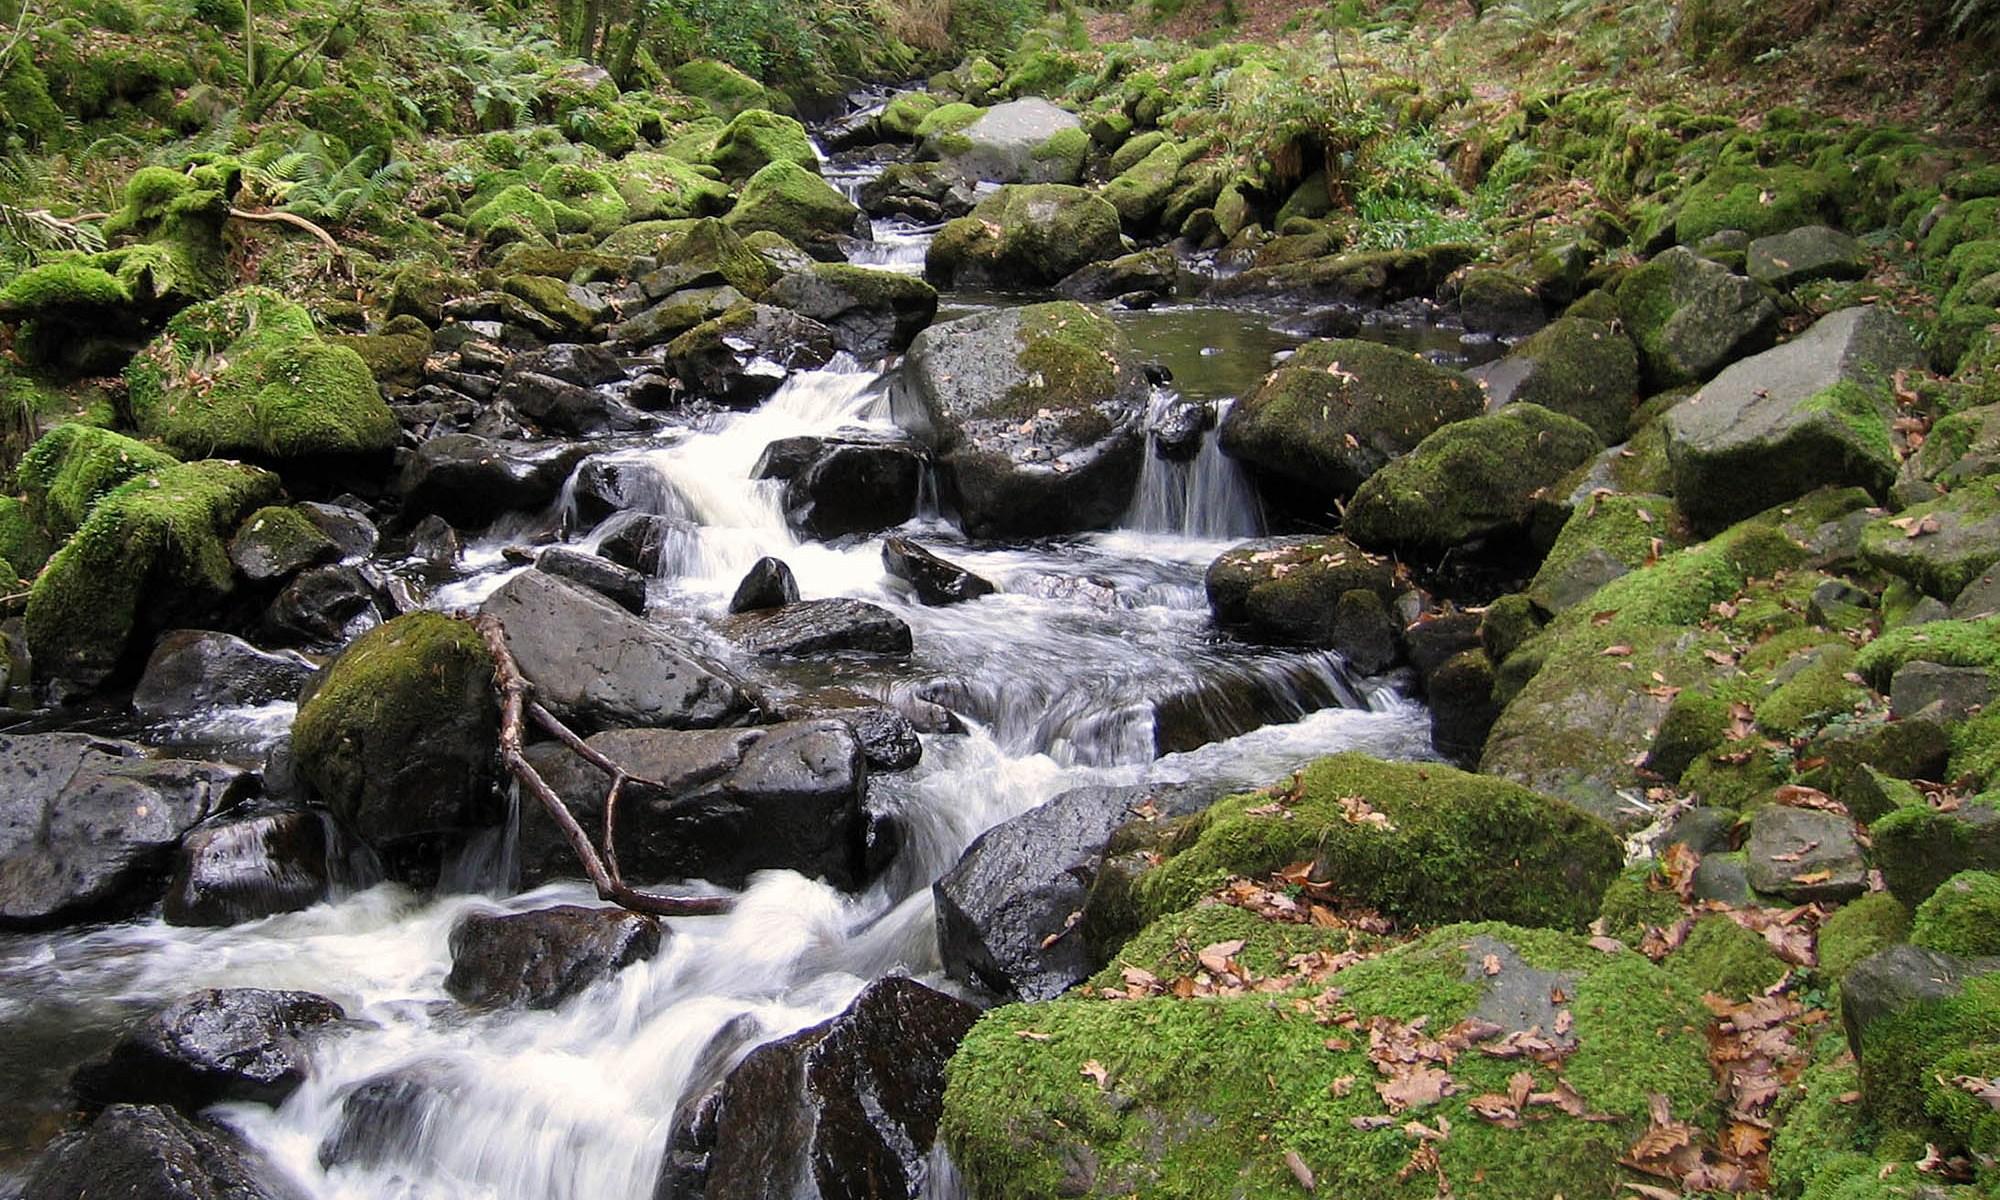 Esk River near Stanley Ghyll